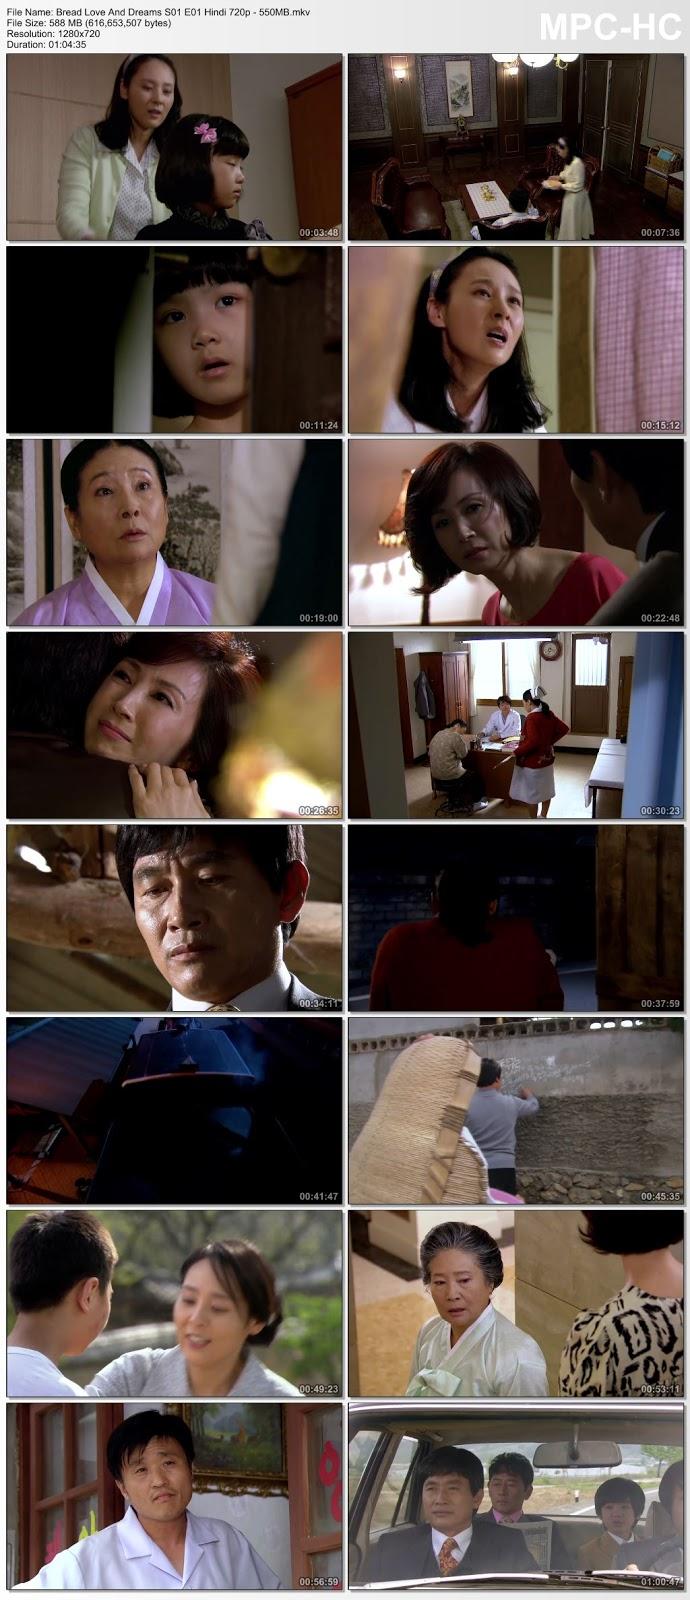 Screen Shoot of Bread Love And Dreams S01 [EP 01-03] Hindi Dubbed 720p HDRip